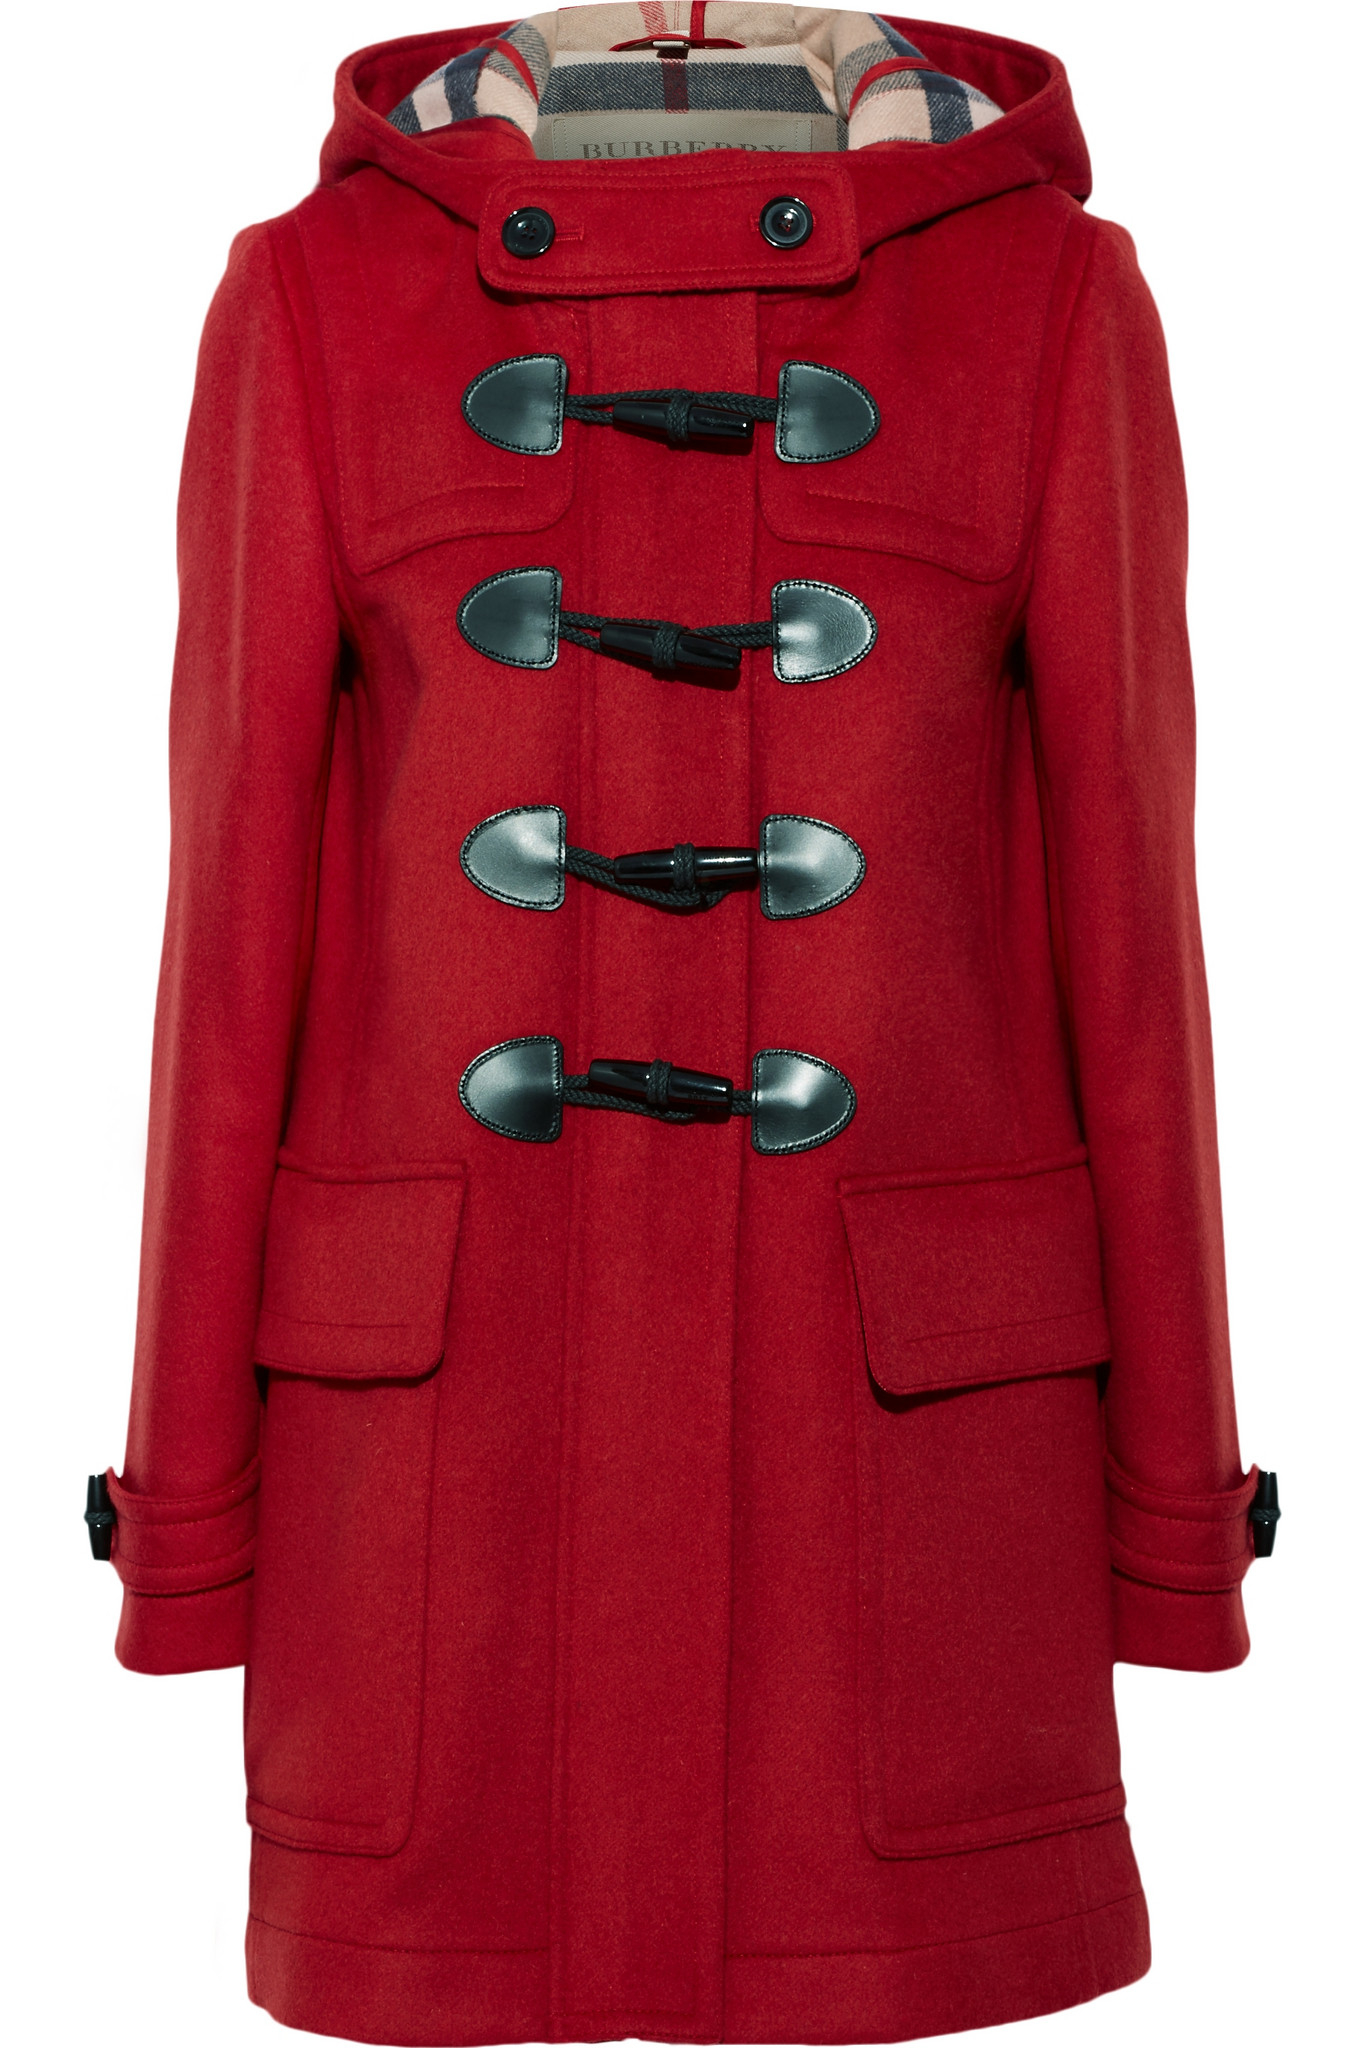 Burberry Hooded Wool-felt Duffle Coat in Red | Lyst